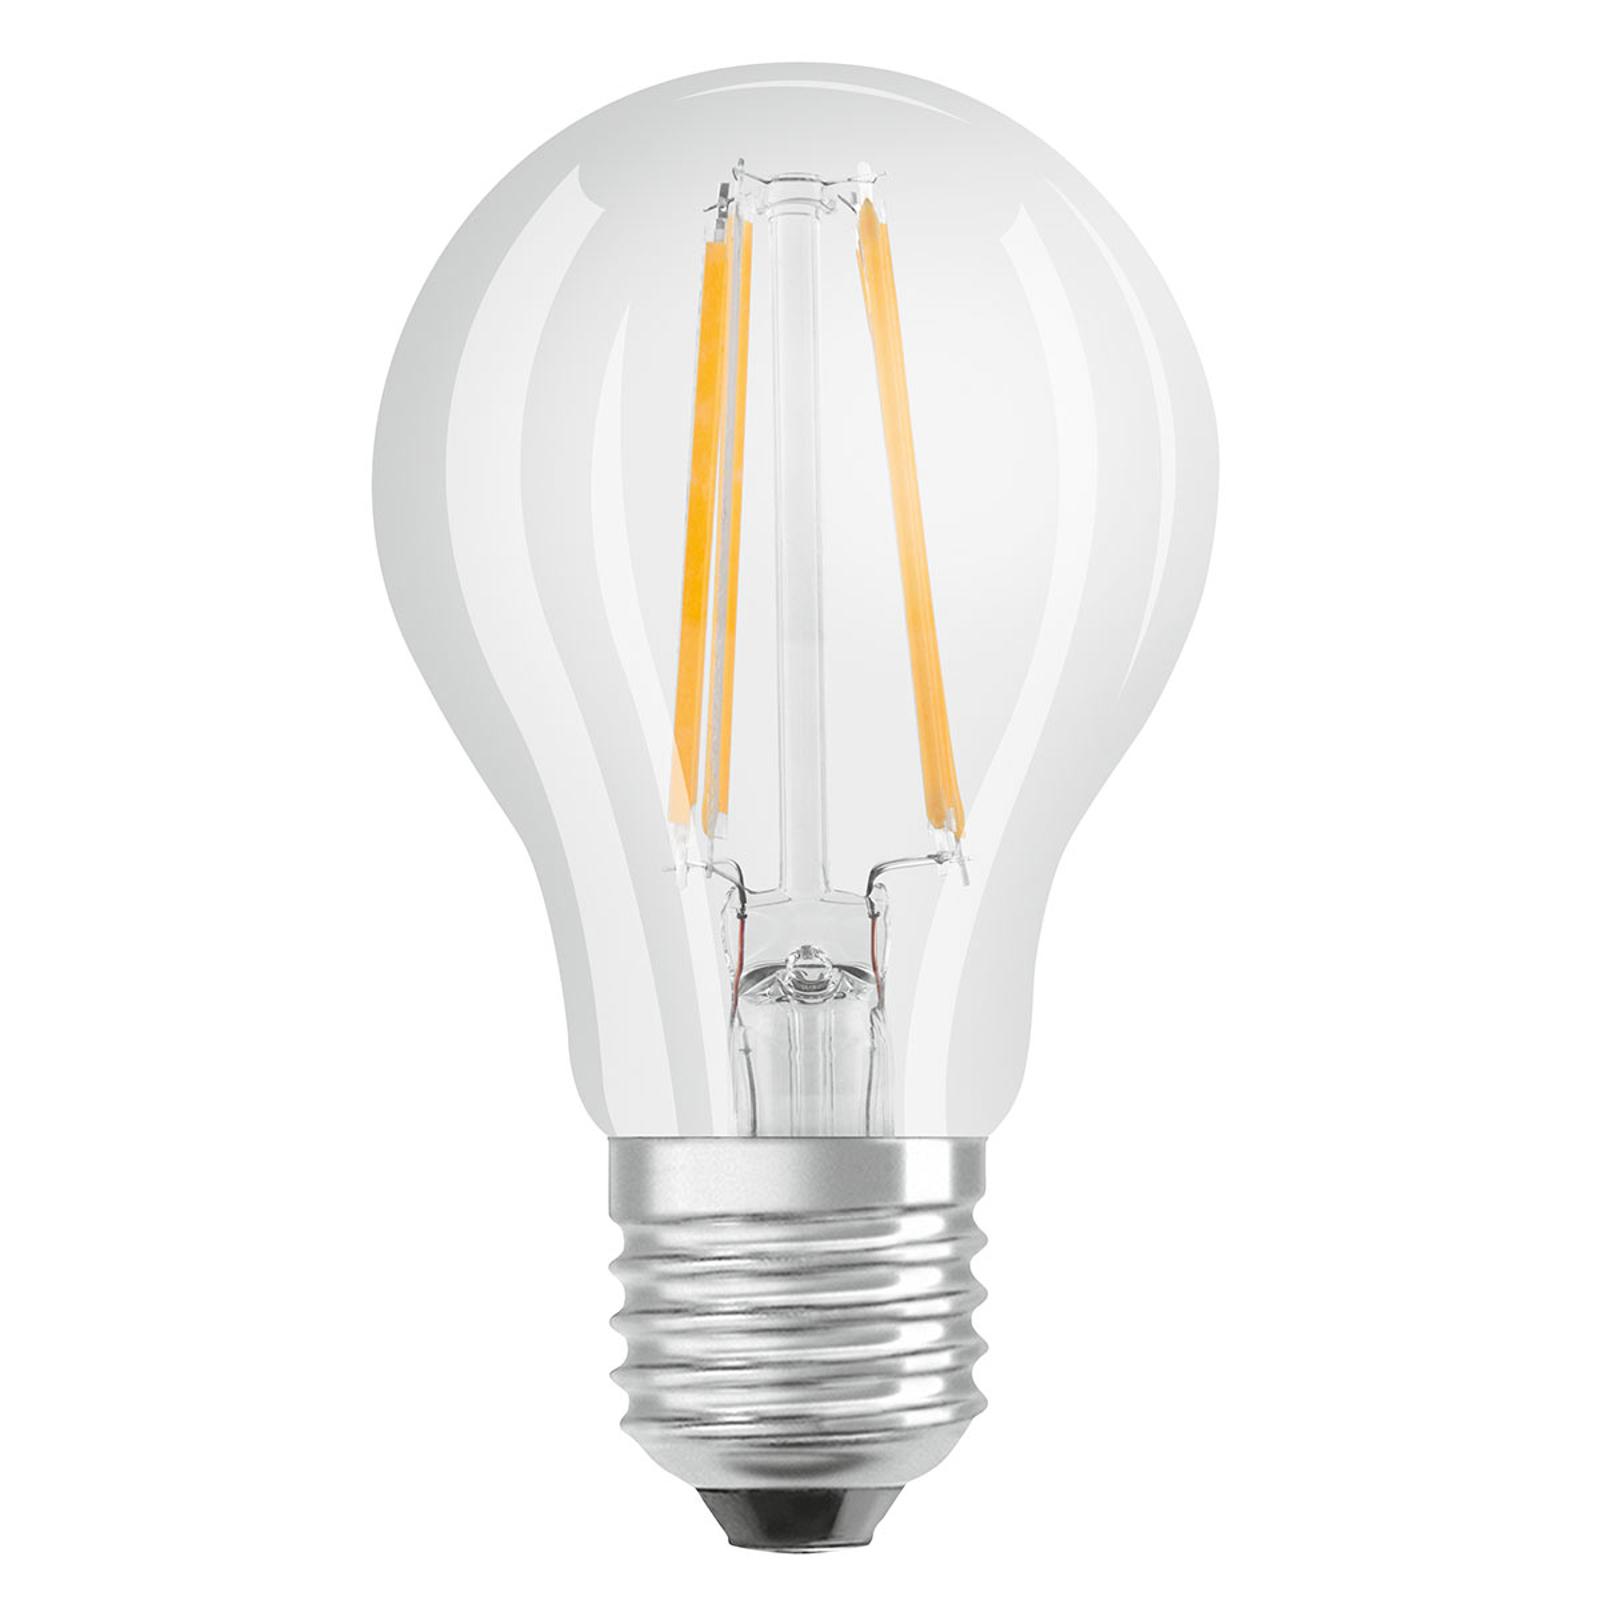 OSRAM-LED-lamppu E27 7W Star+ Relax&Active kirkas